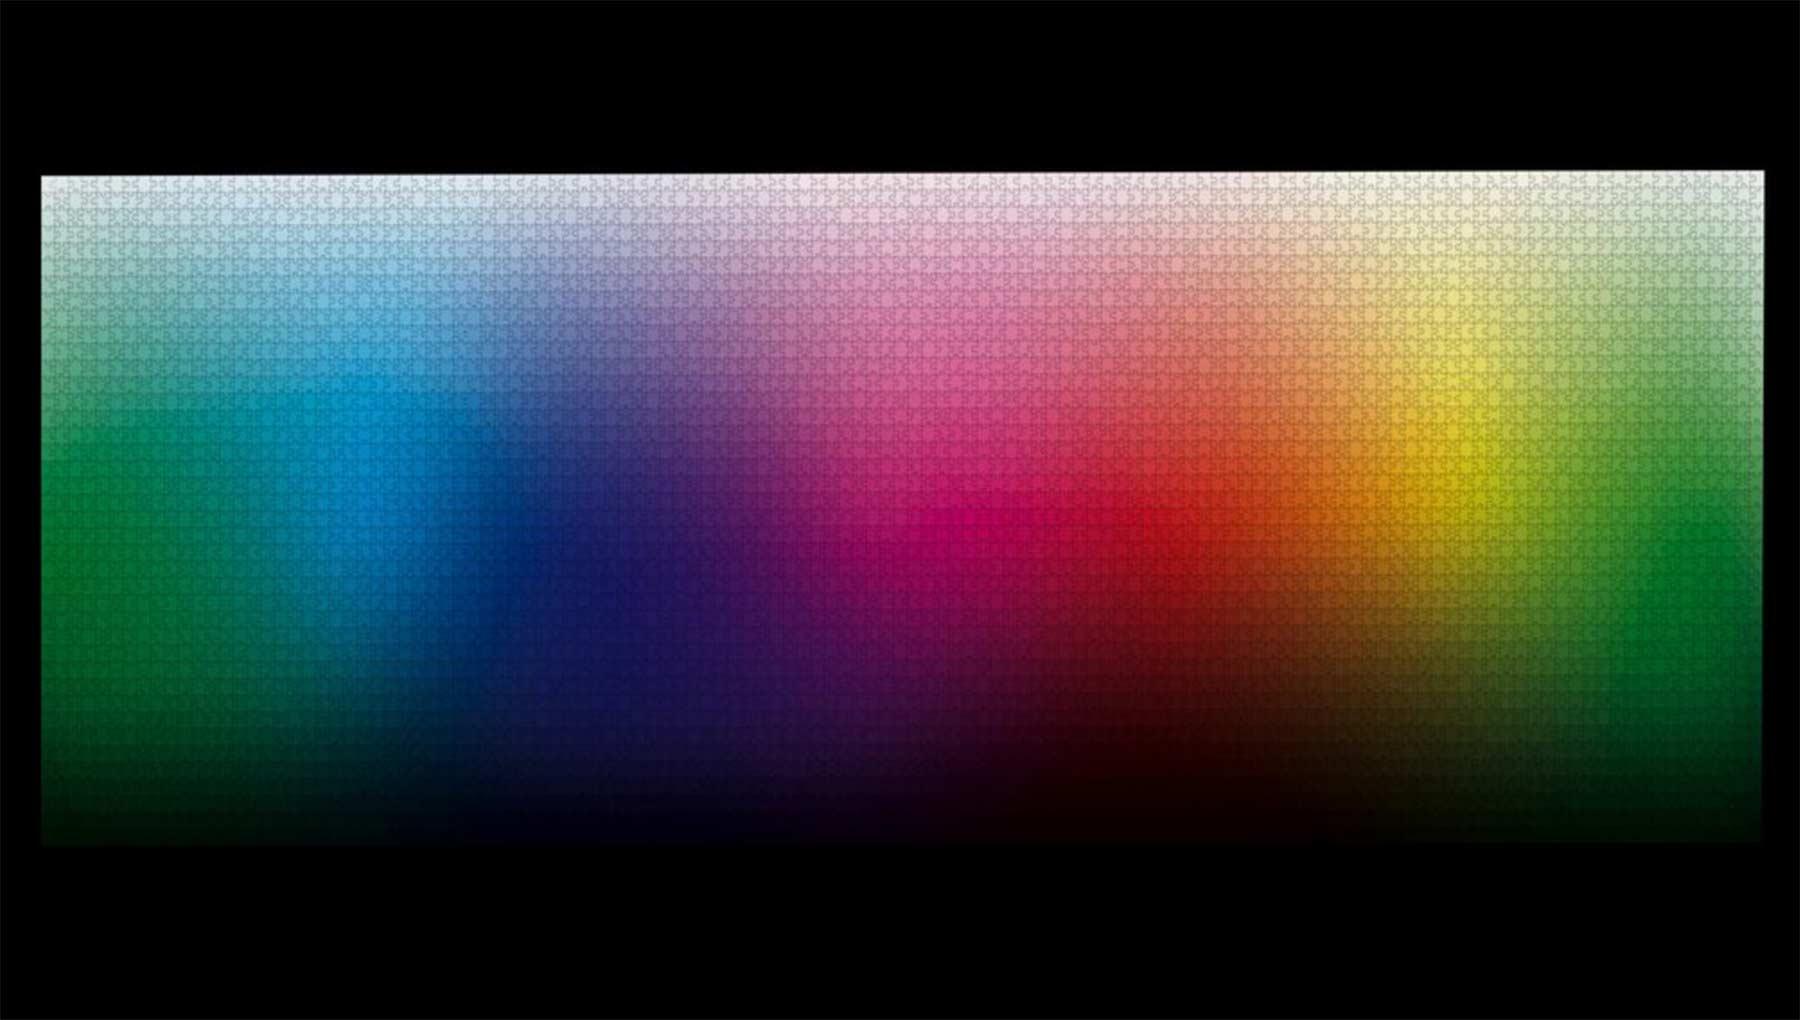 Farbverlauf-Puzzle mit 5.000 Teilen 5000-colors-puzzle_01